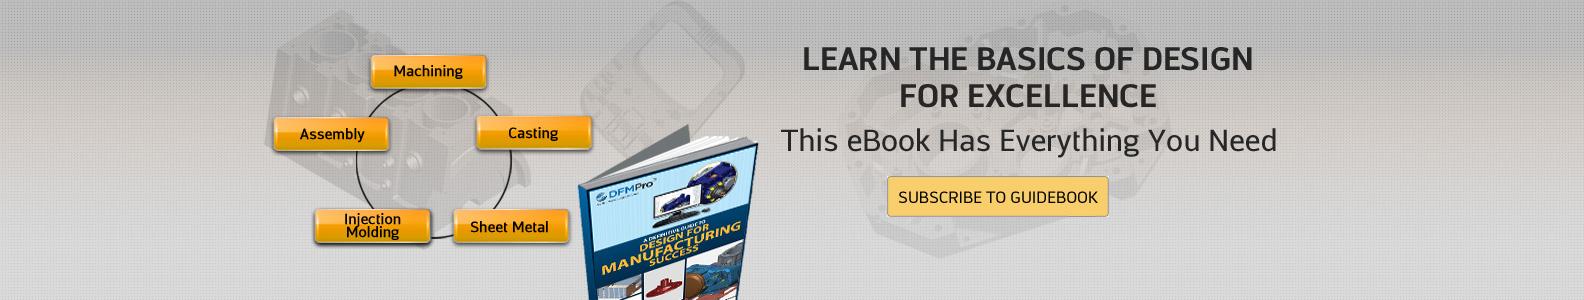 DFM Guidebook